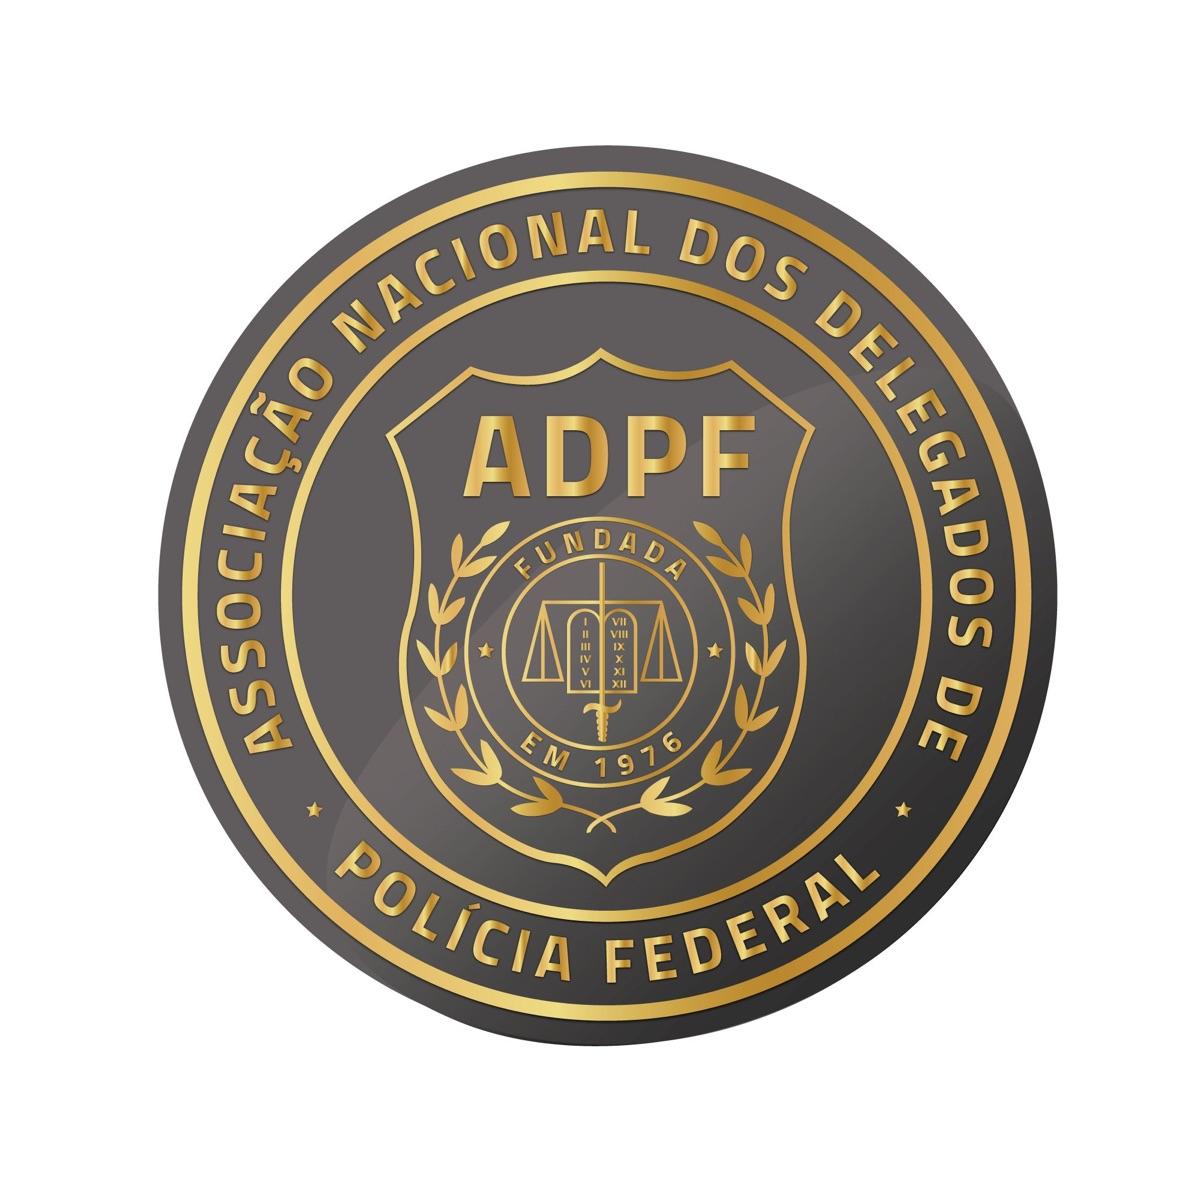 ADPFcast